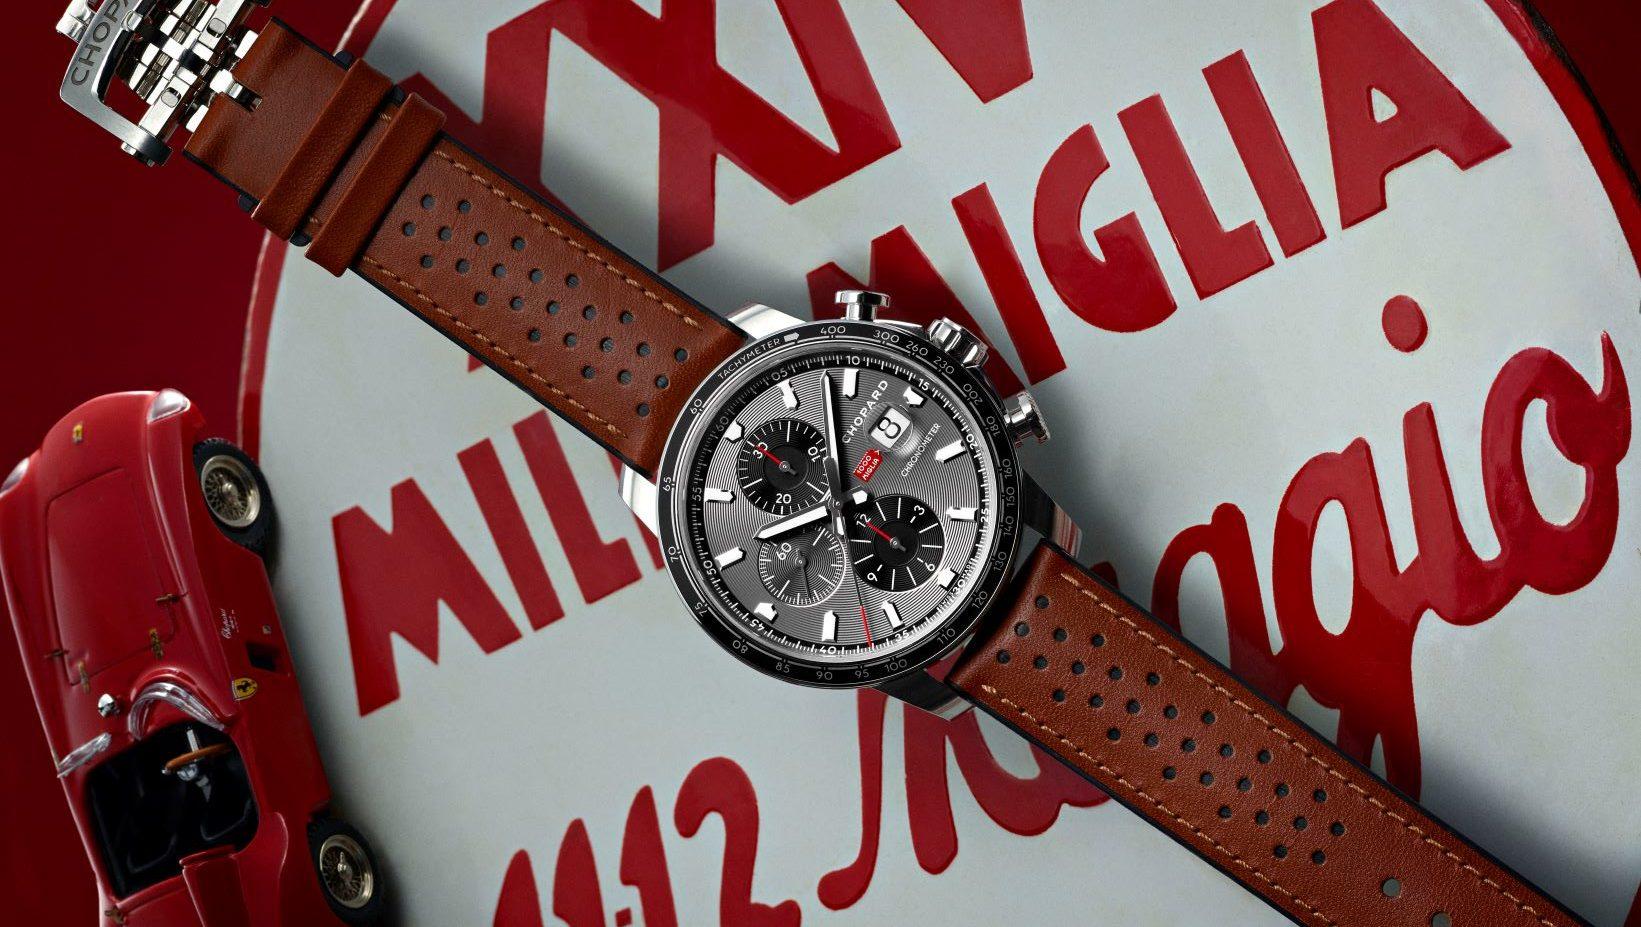 Mille Miglia 2019 Race Edition chronograph